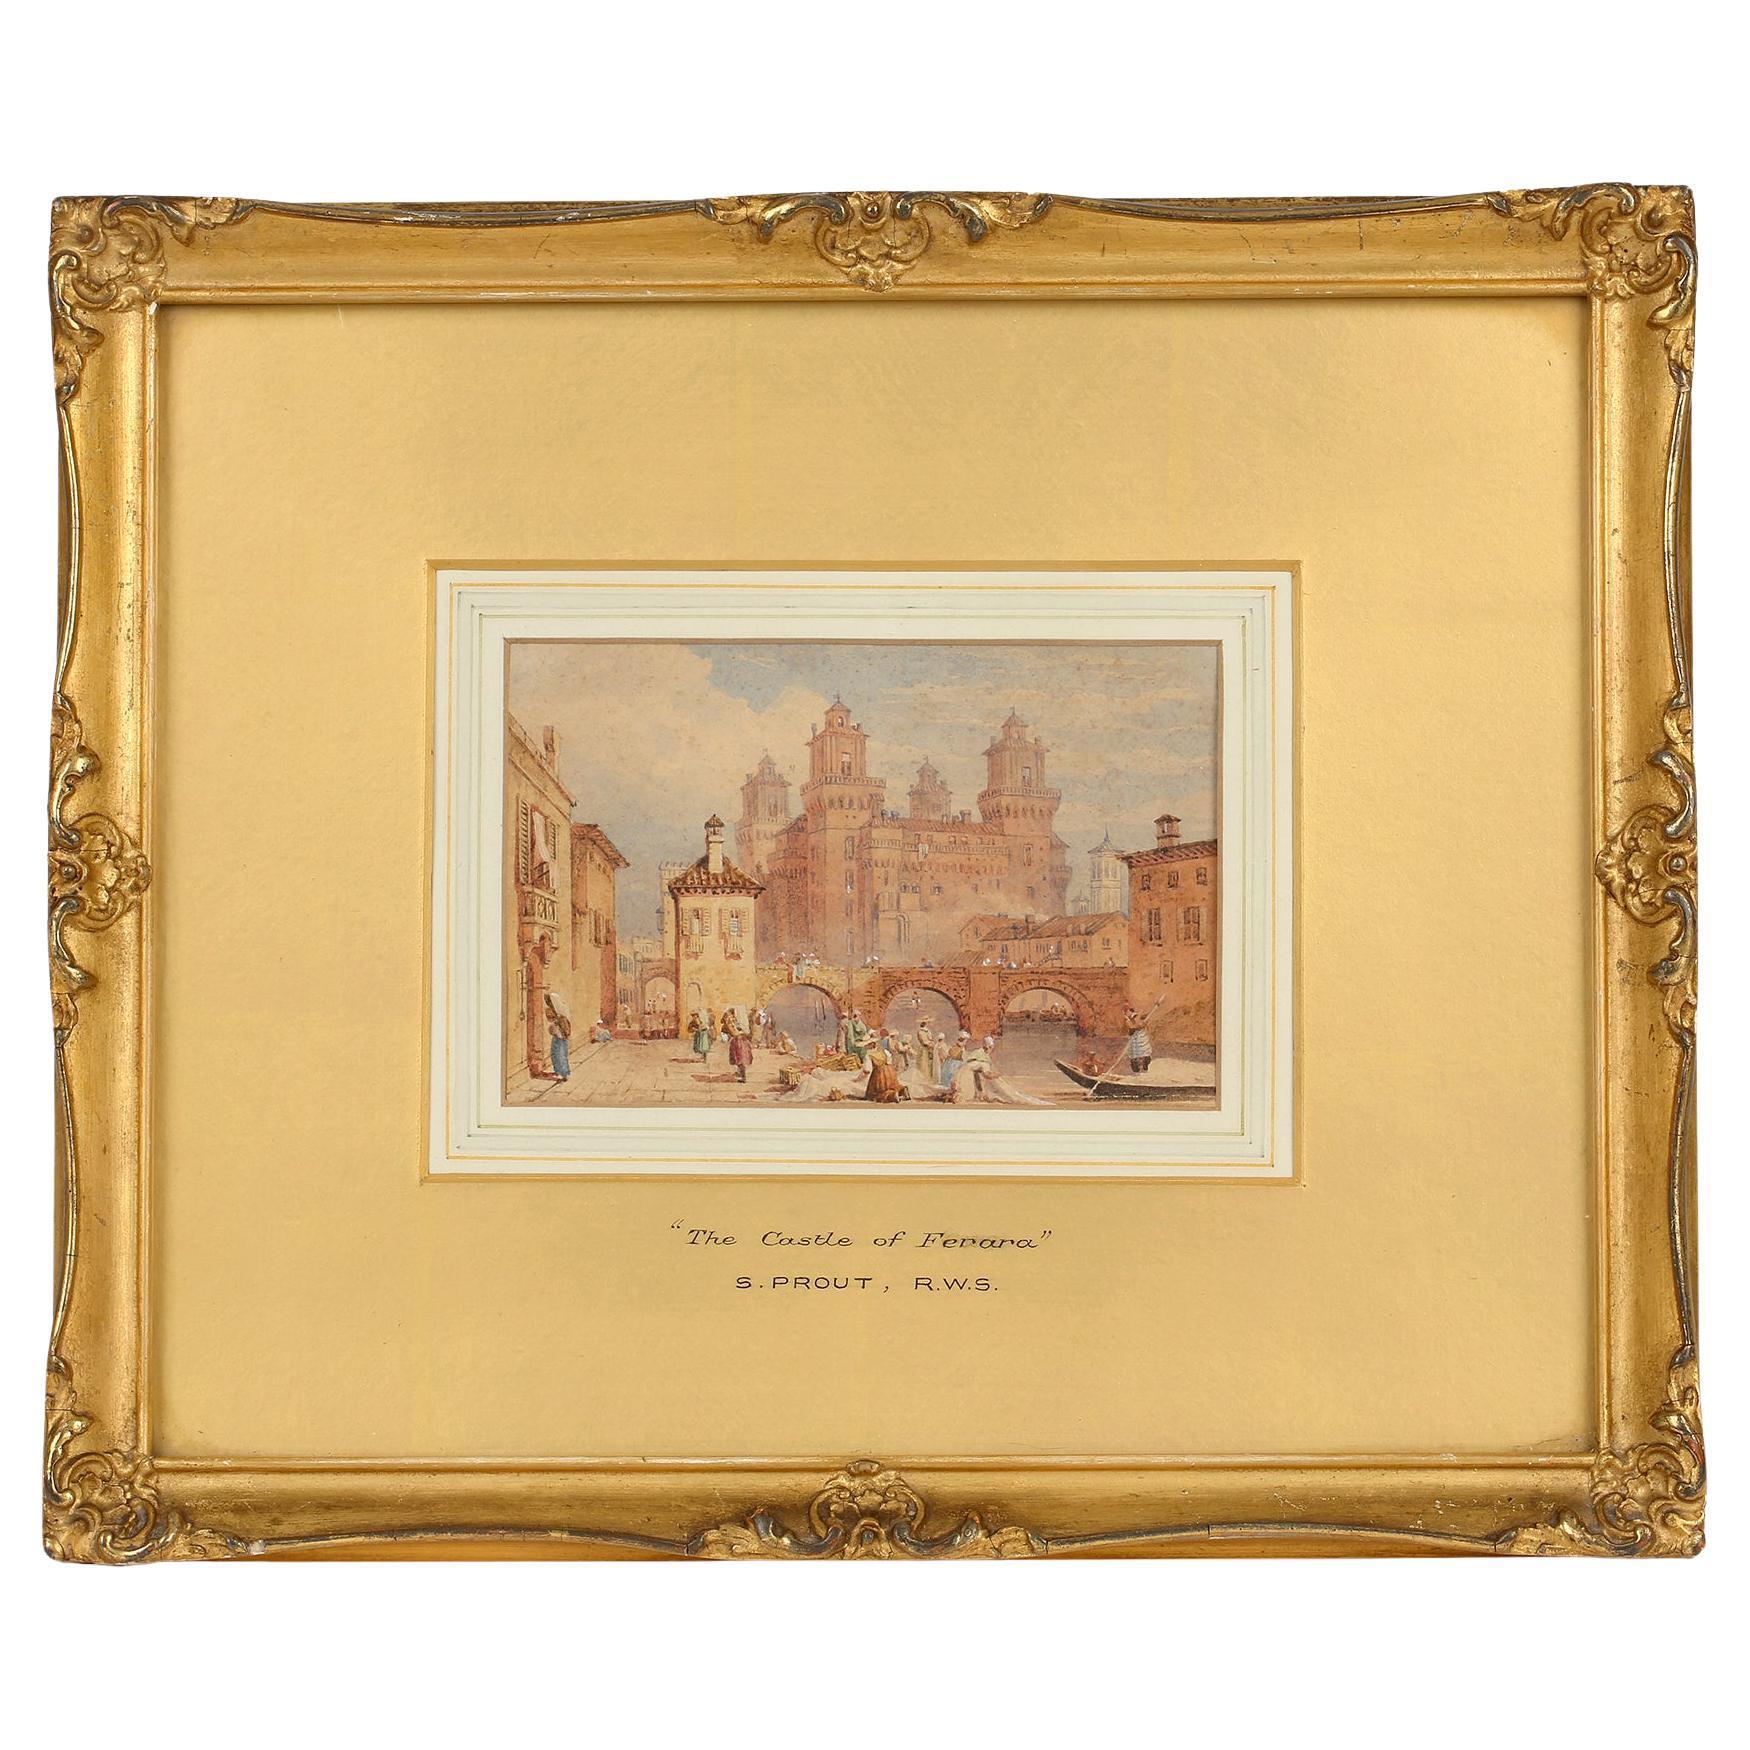 Samuel Prout RWS Framed Watercolour 'The Castle of Ferara'